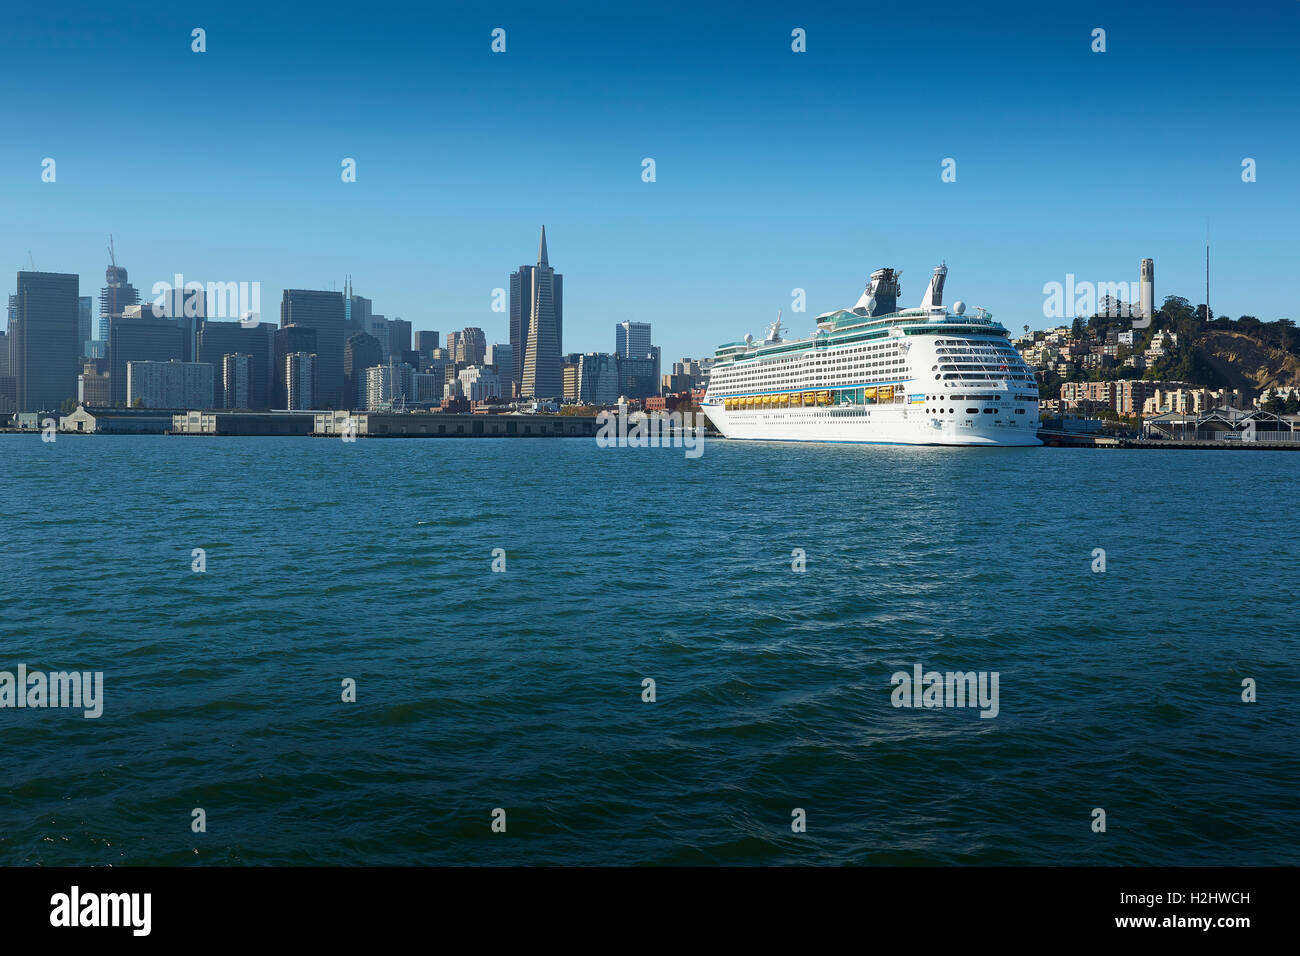 royal caribbean cruise ship explorer of the seas in new york